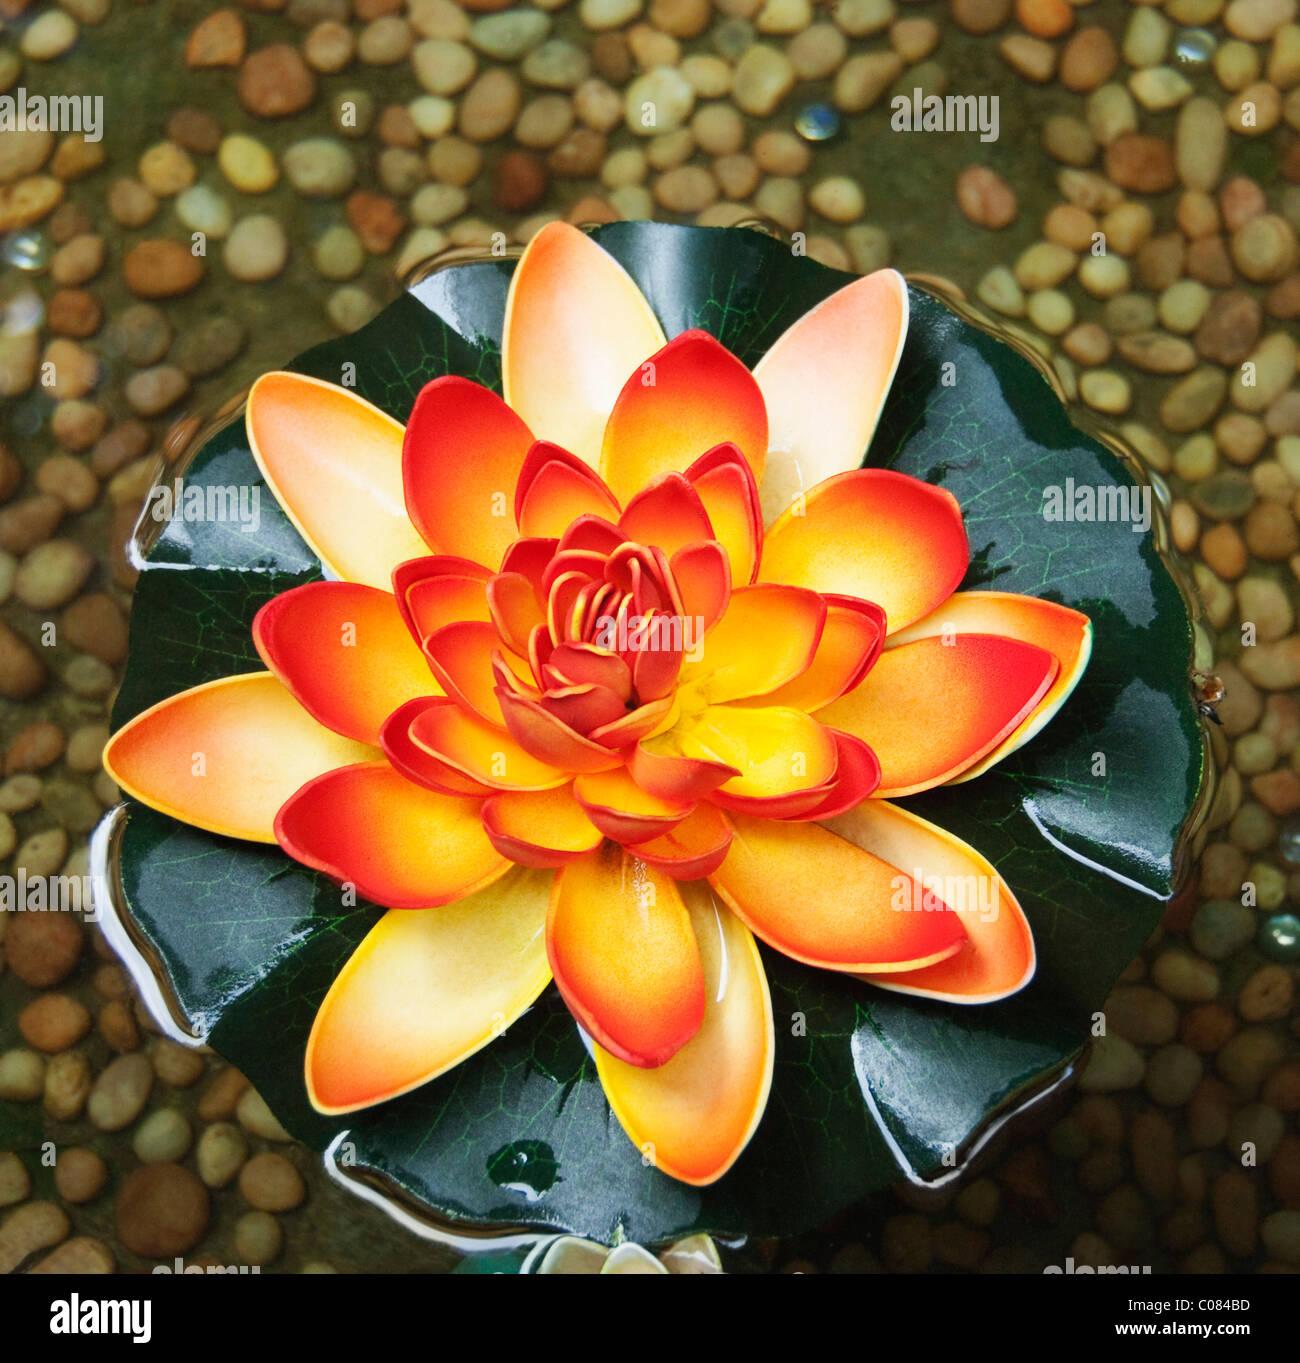 Erhöhte Ansicht einer Lotusblüte, Tirupati, Andhra Pradesh, Indien Stockbild